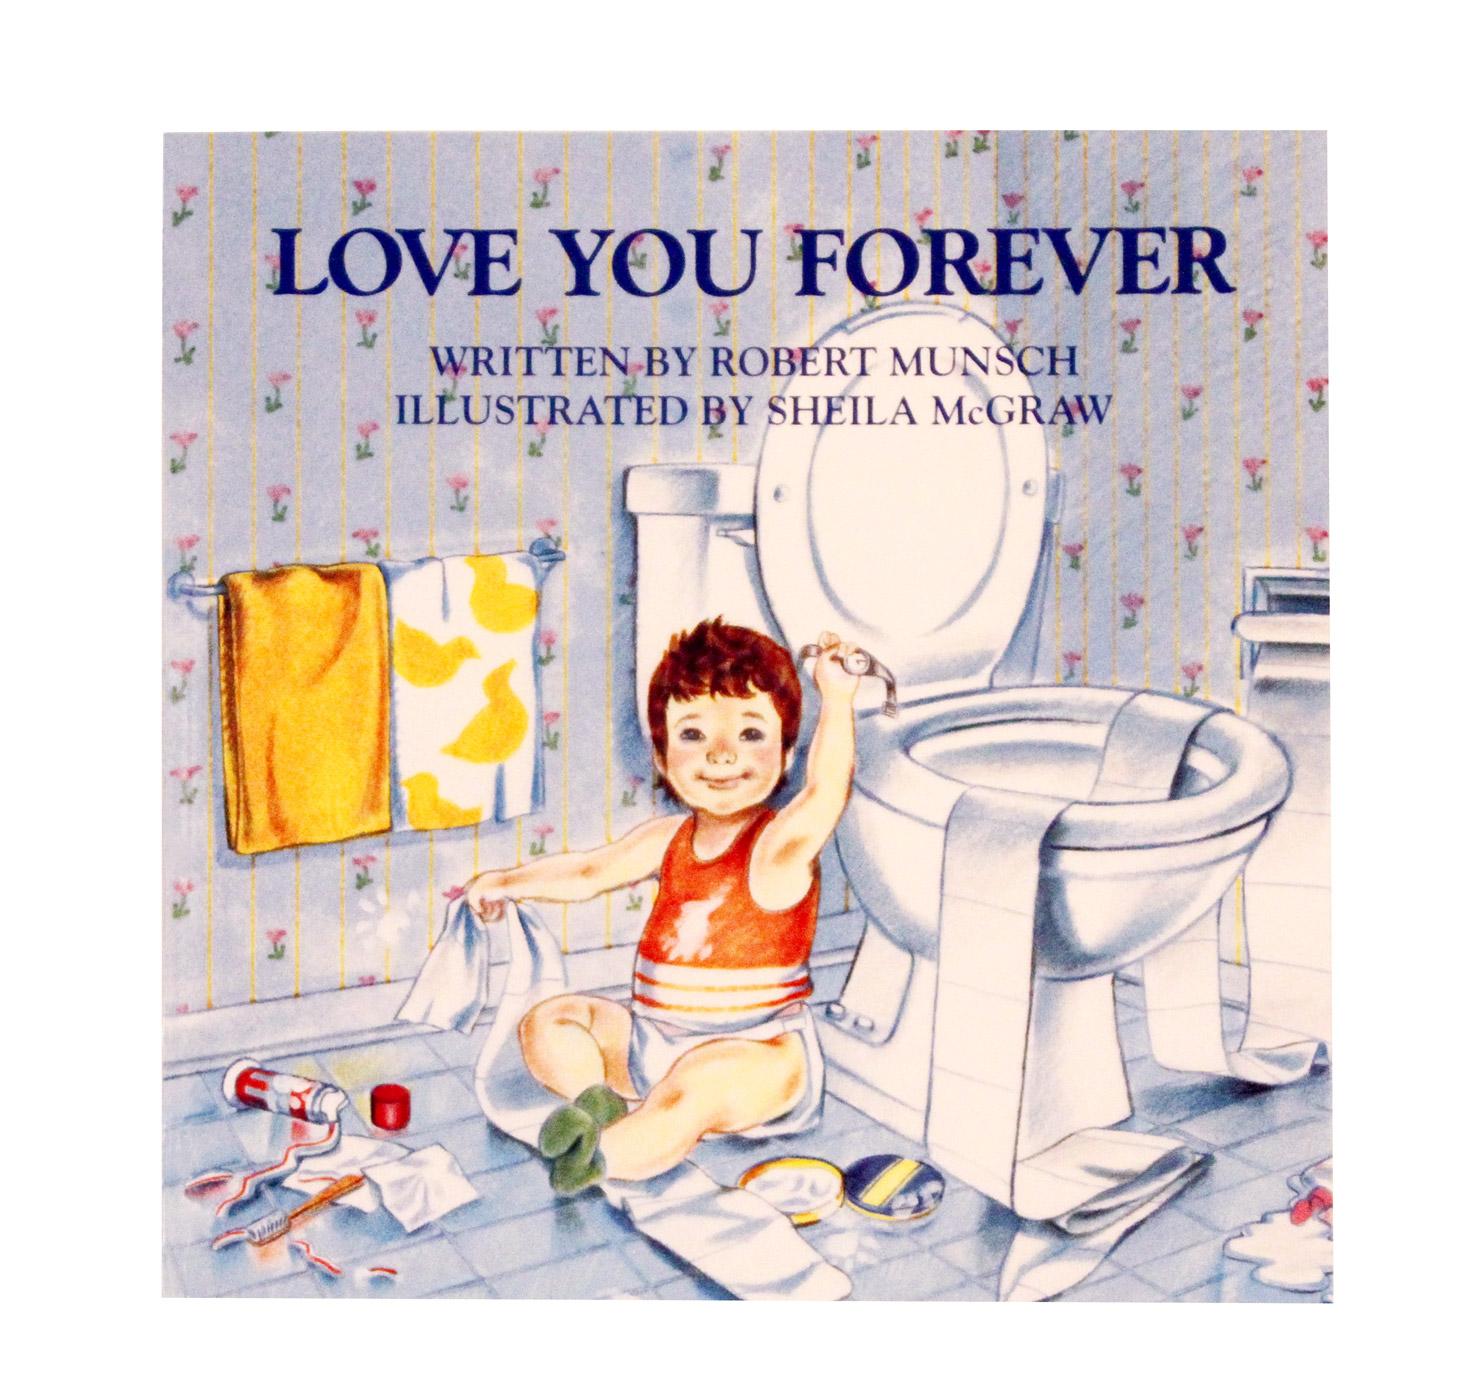 I-love-you-forever-book3.jpg